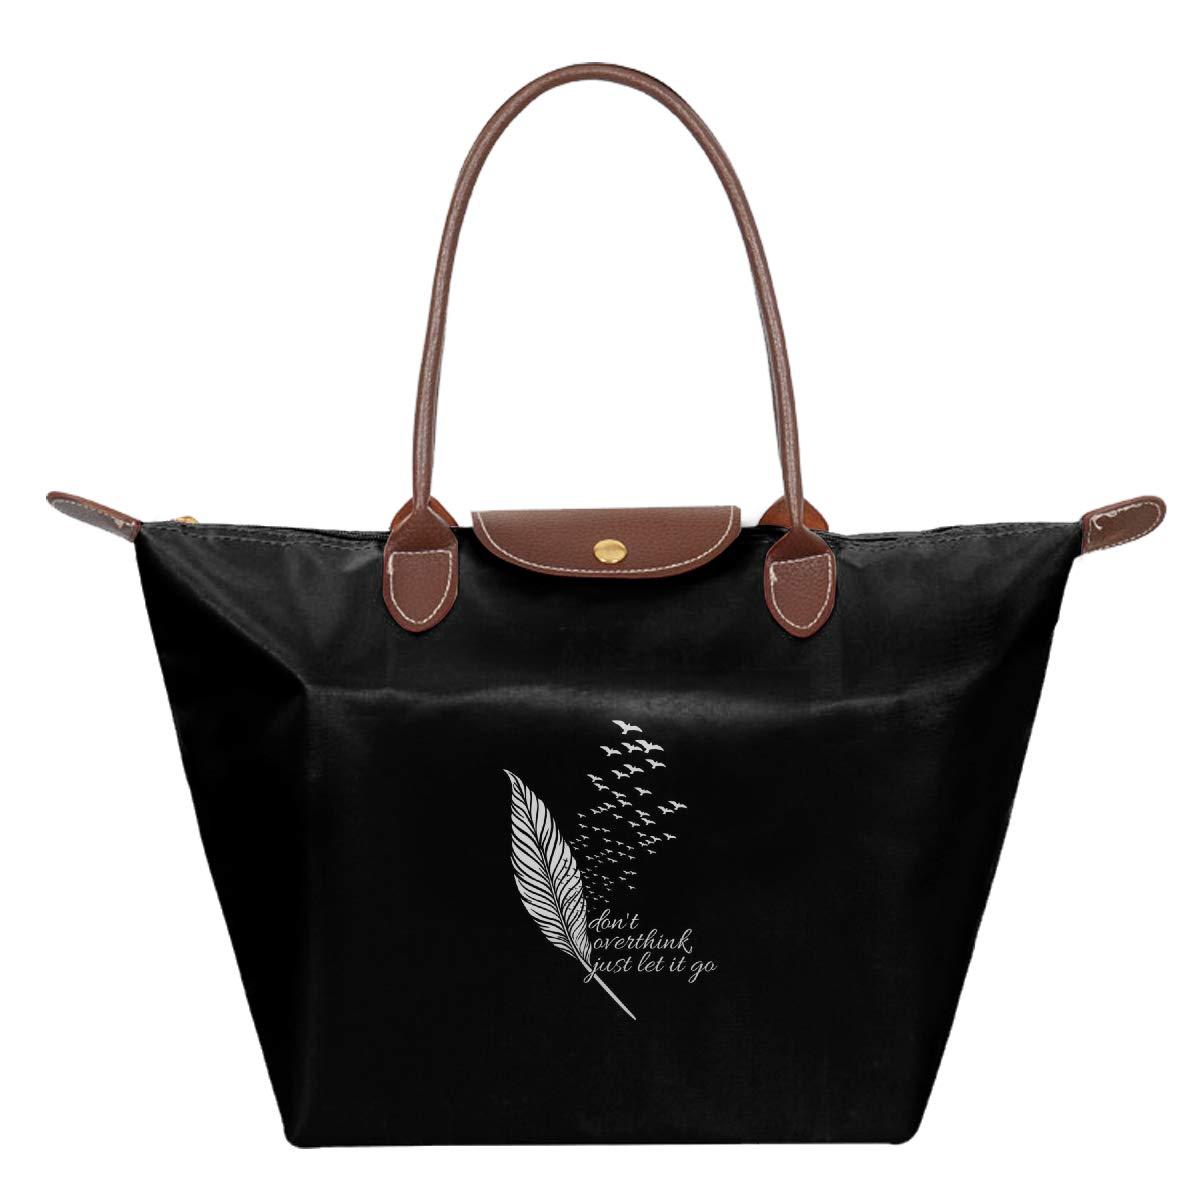 Dont Overthink Just Let It Go Waterproof Leather Folded Messenger Nylon Bag Travel Tote Hopping Folding School Handbags